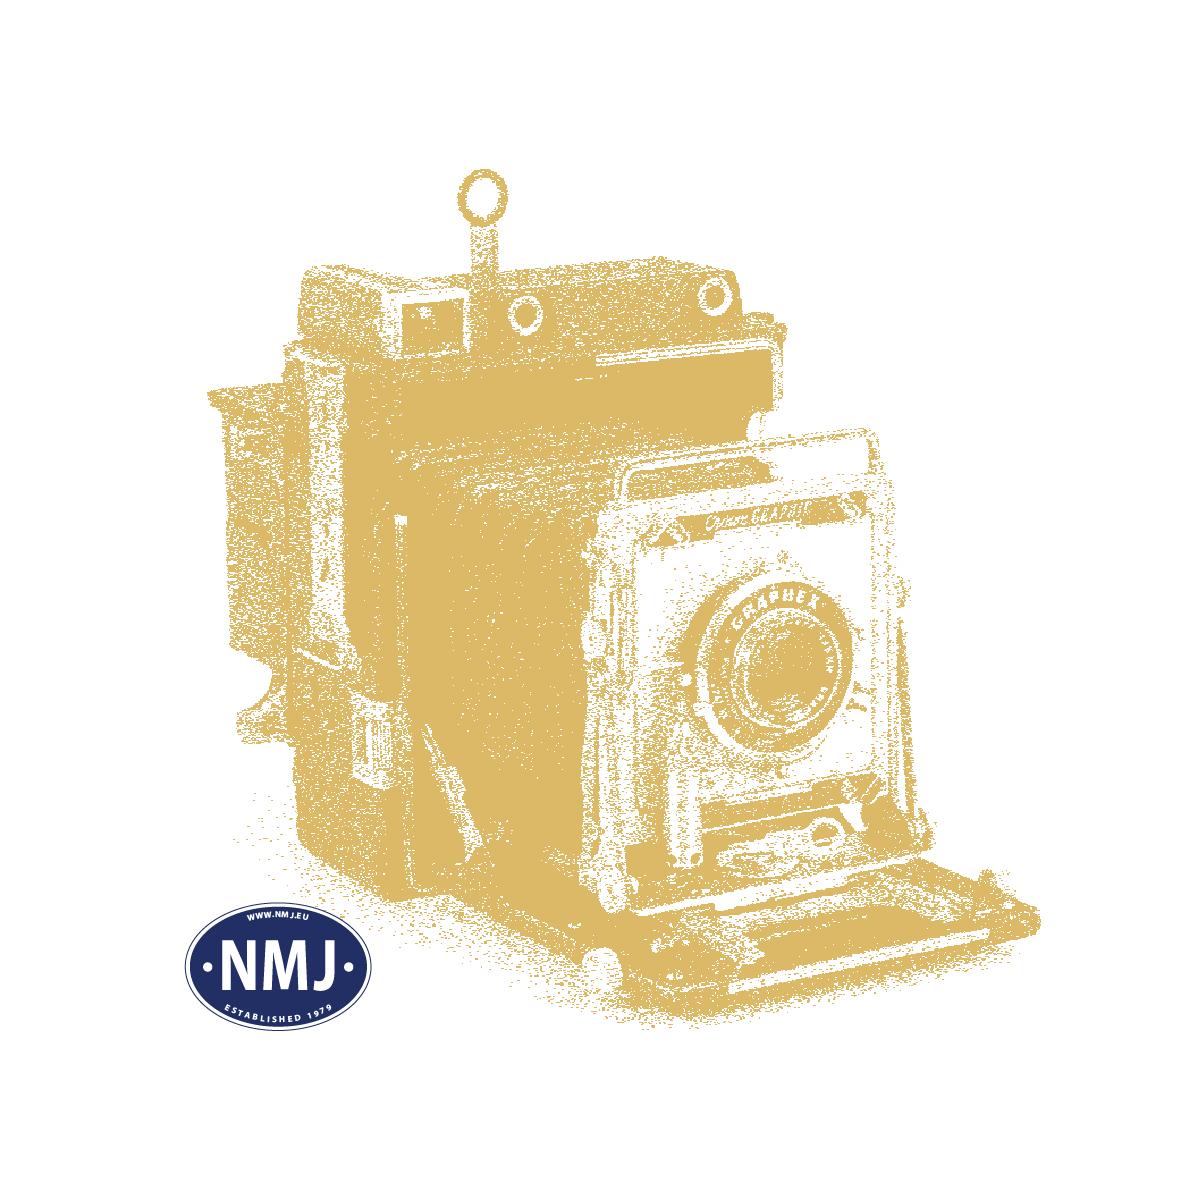 NMJT135.201 - NMJ Topline NSB AB11 24104, Red/Silver